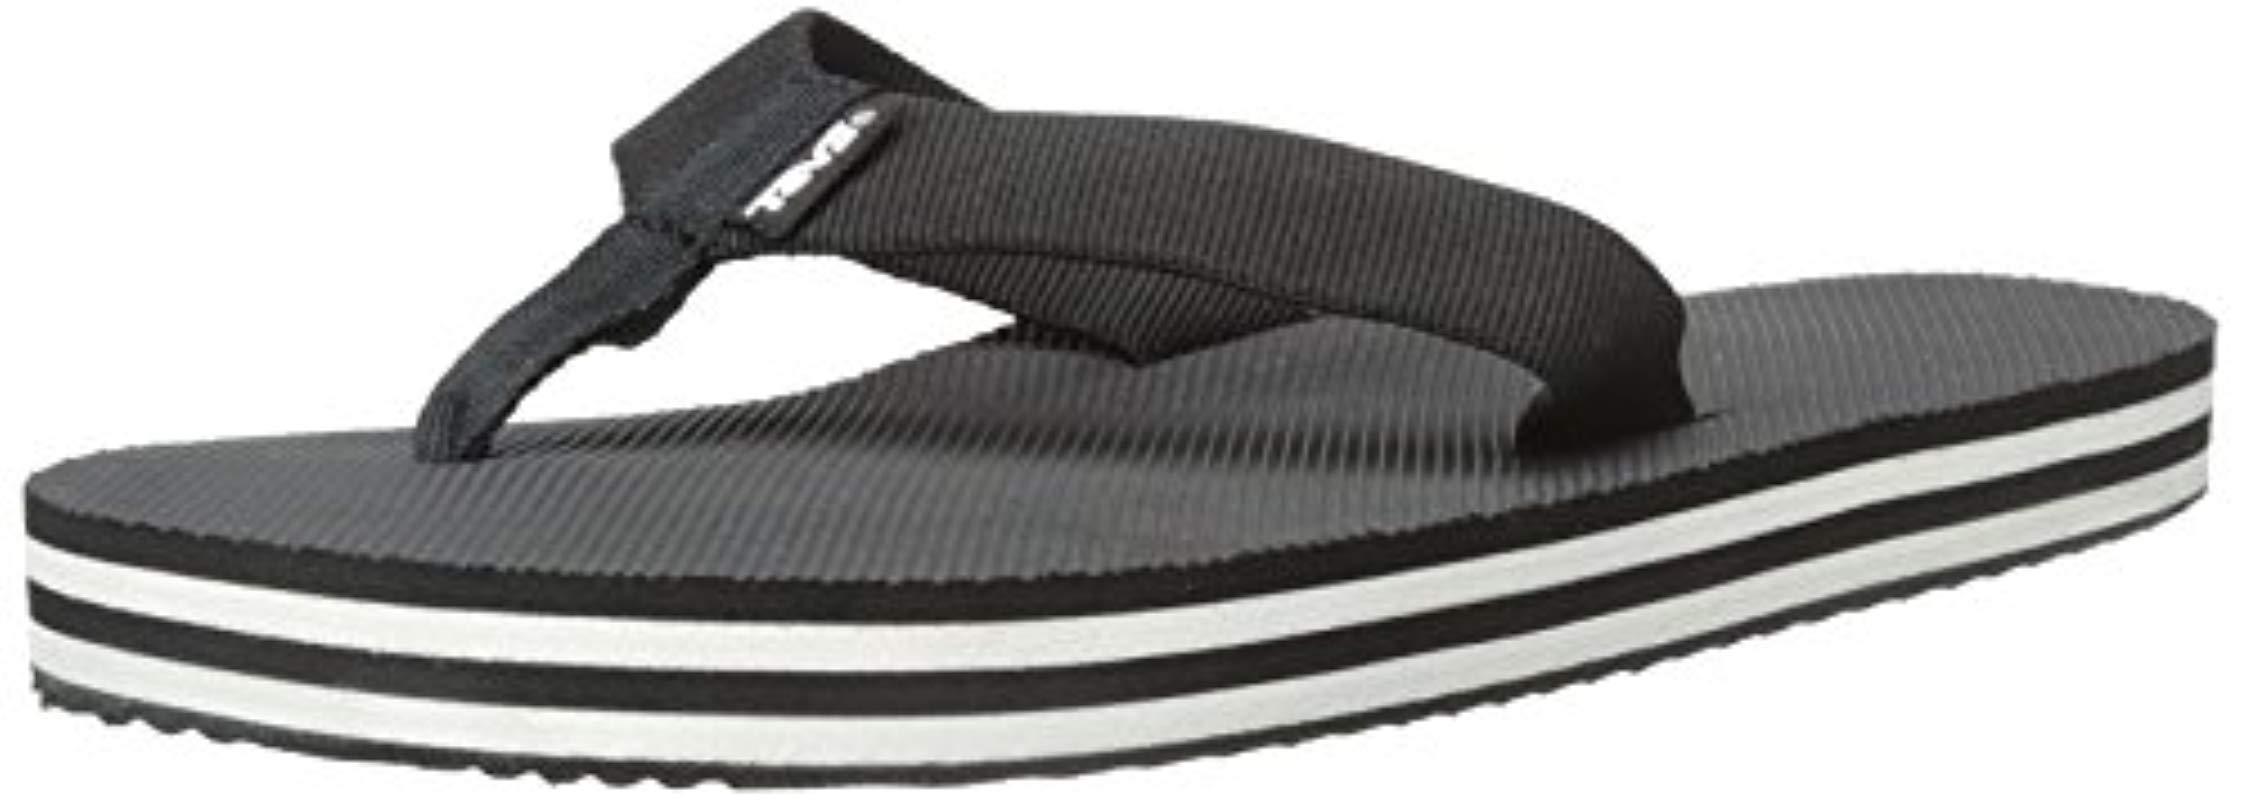 12ad9777a60b2b Lyst - Teva Deckers Flip-flop in Black